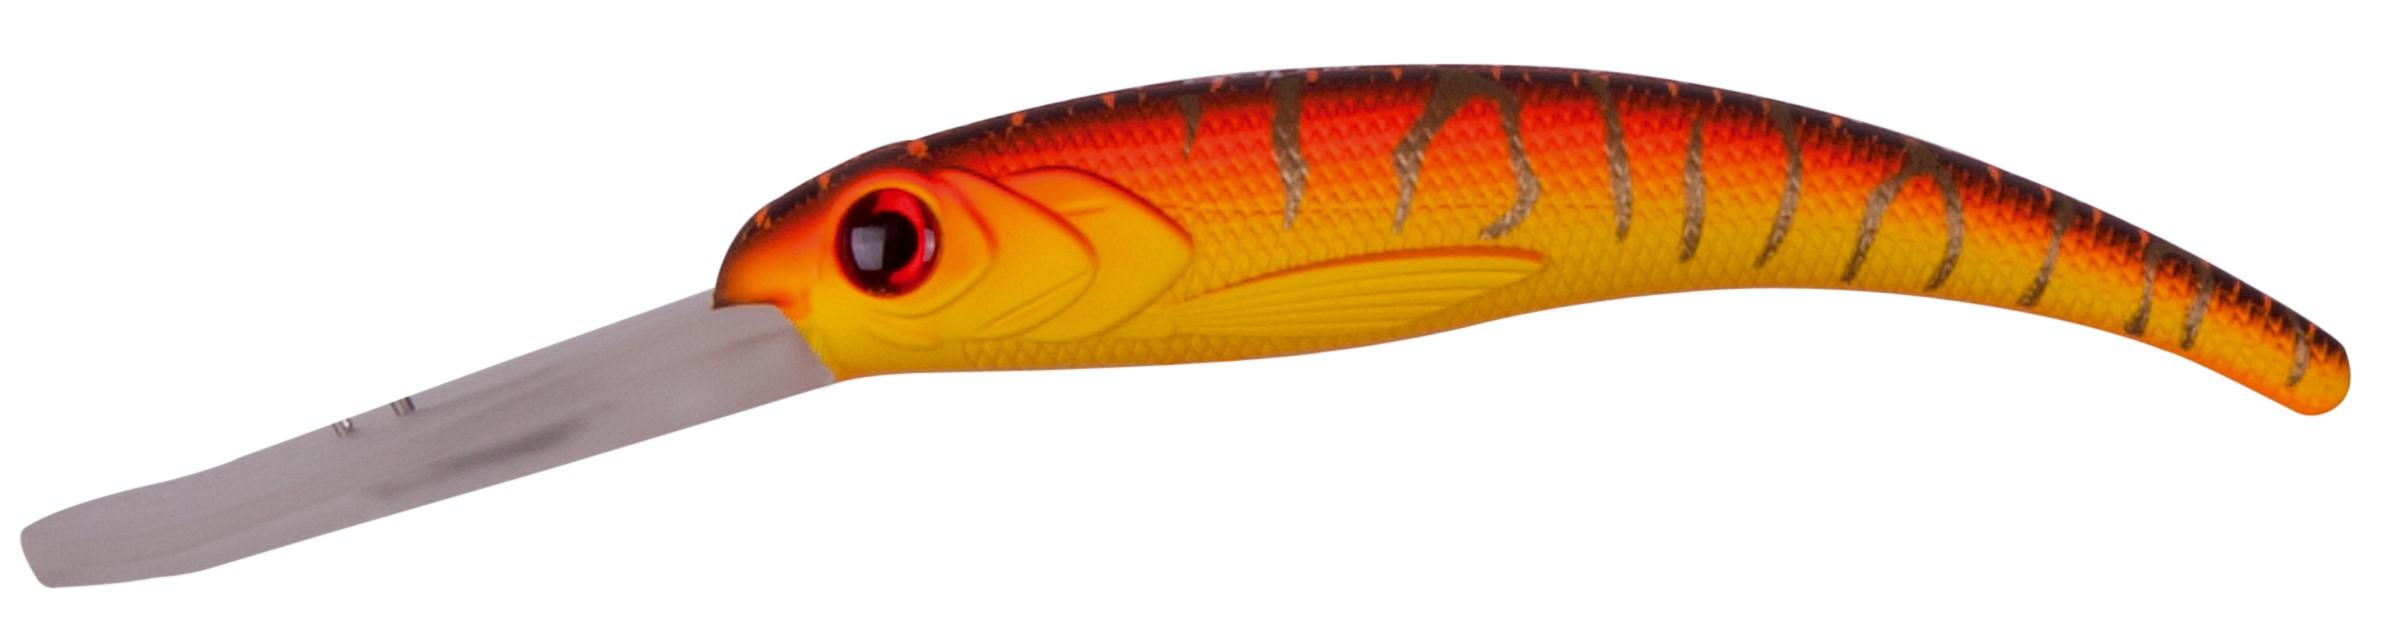 Doiyo wobler Azuki 92 Fukai, 9,2 cm, 15,4 g, vzor SB